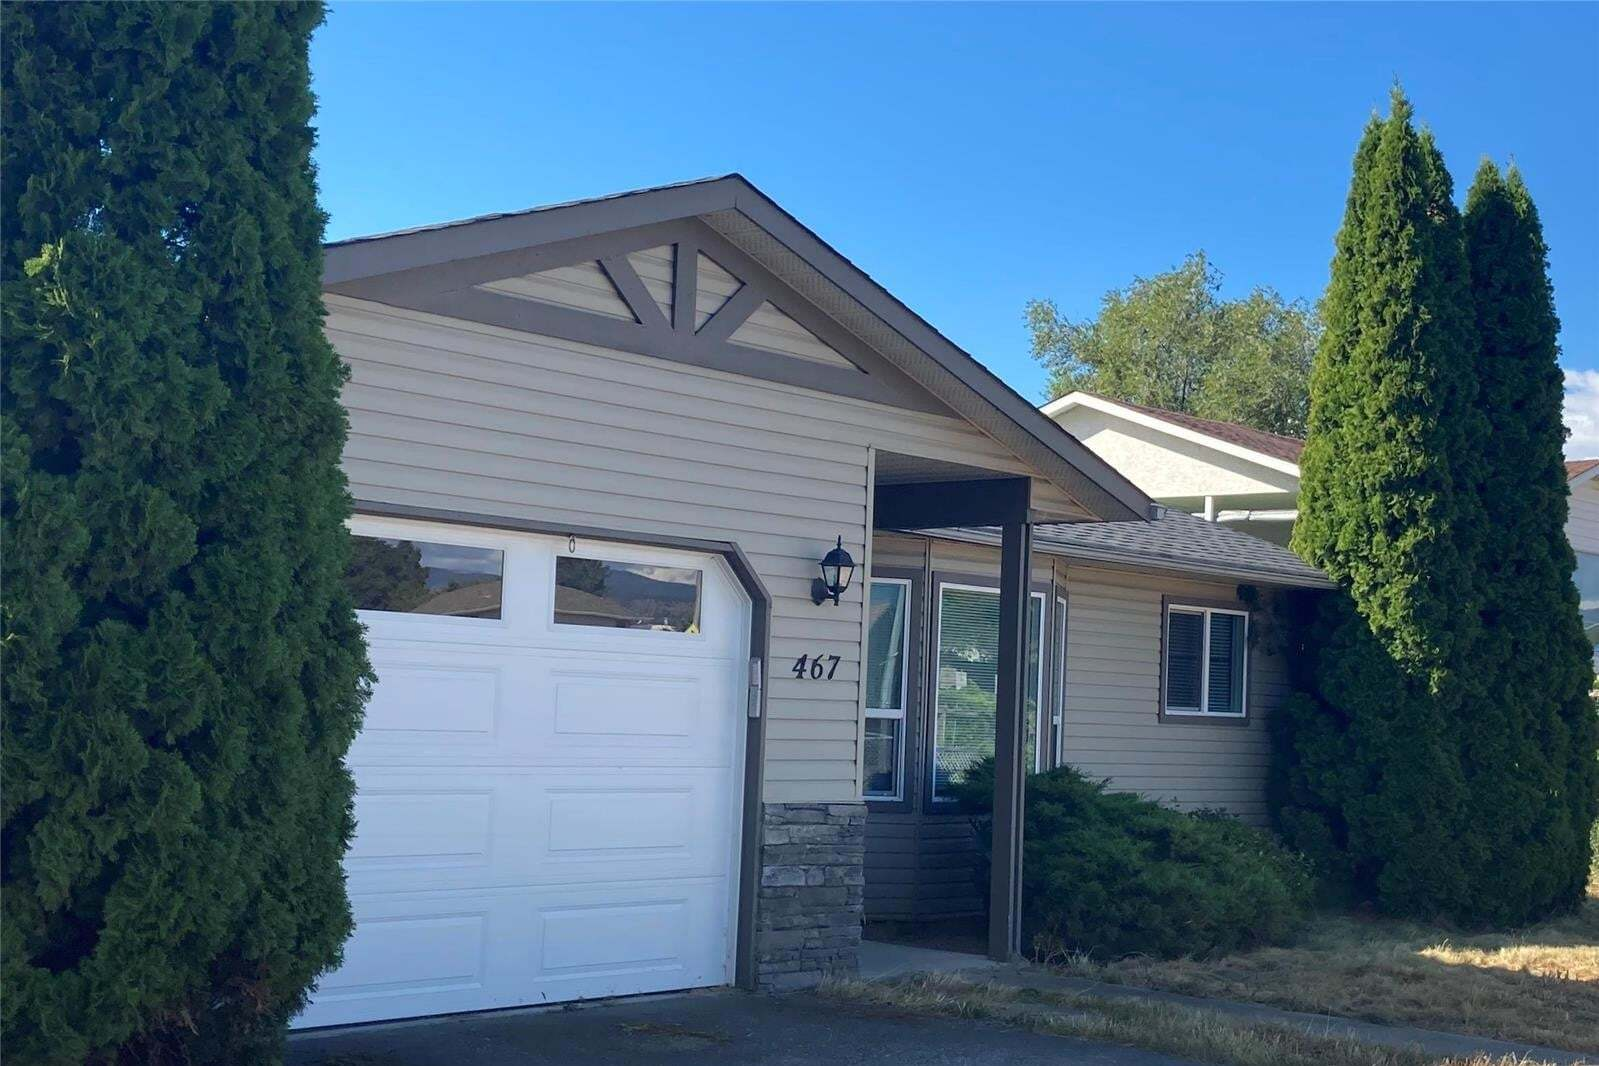 House for sale at 467 33 Hy East Kelowna British Columbia - MLS: 10214701